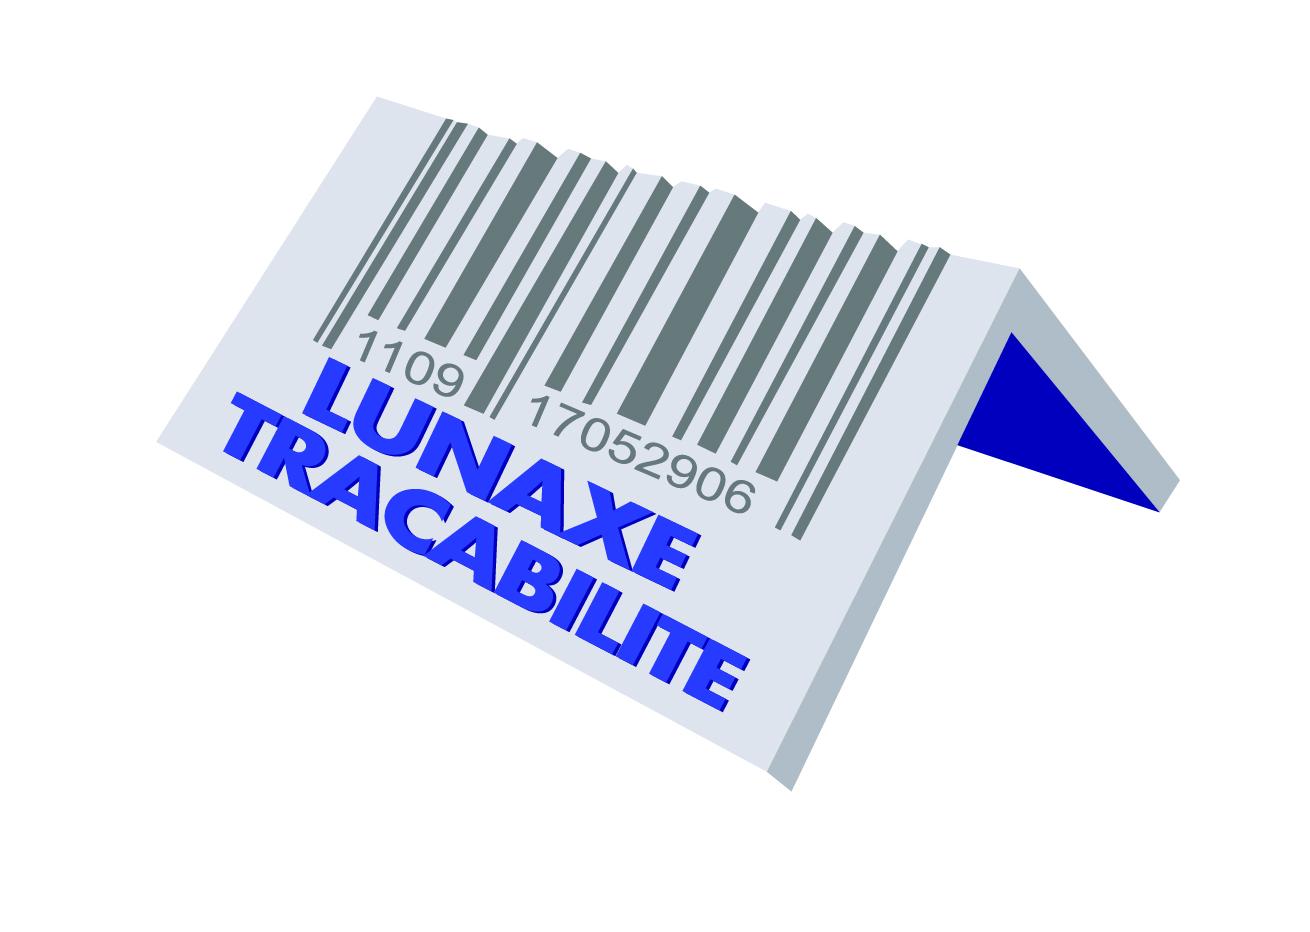 LUNAXE TRA ABILITE (LUNAXE TRAÇABILITE)